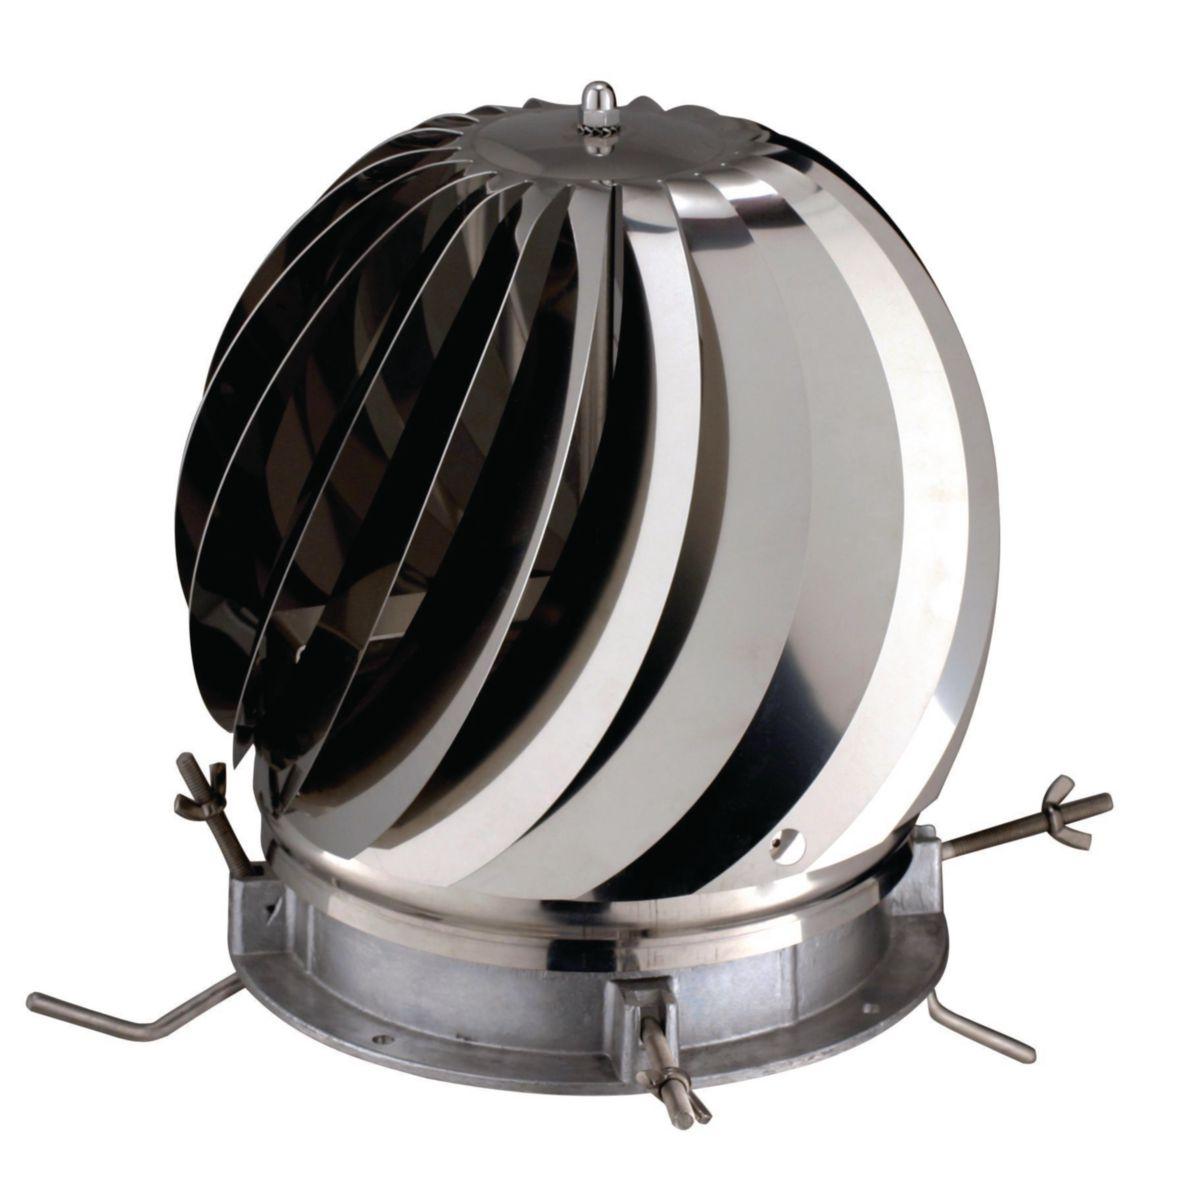 Aspirateur rotatif ASPIROTOR, diamètre 175 / 235 mm ASPIR. 175 235 / réf. 57190561